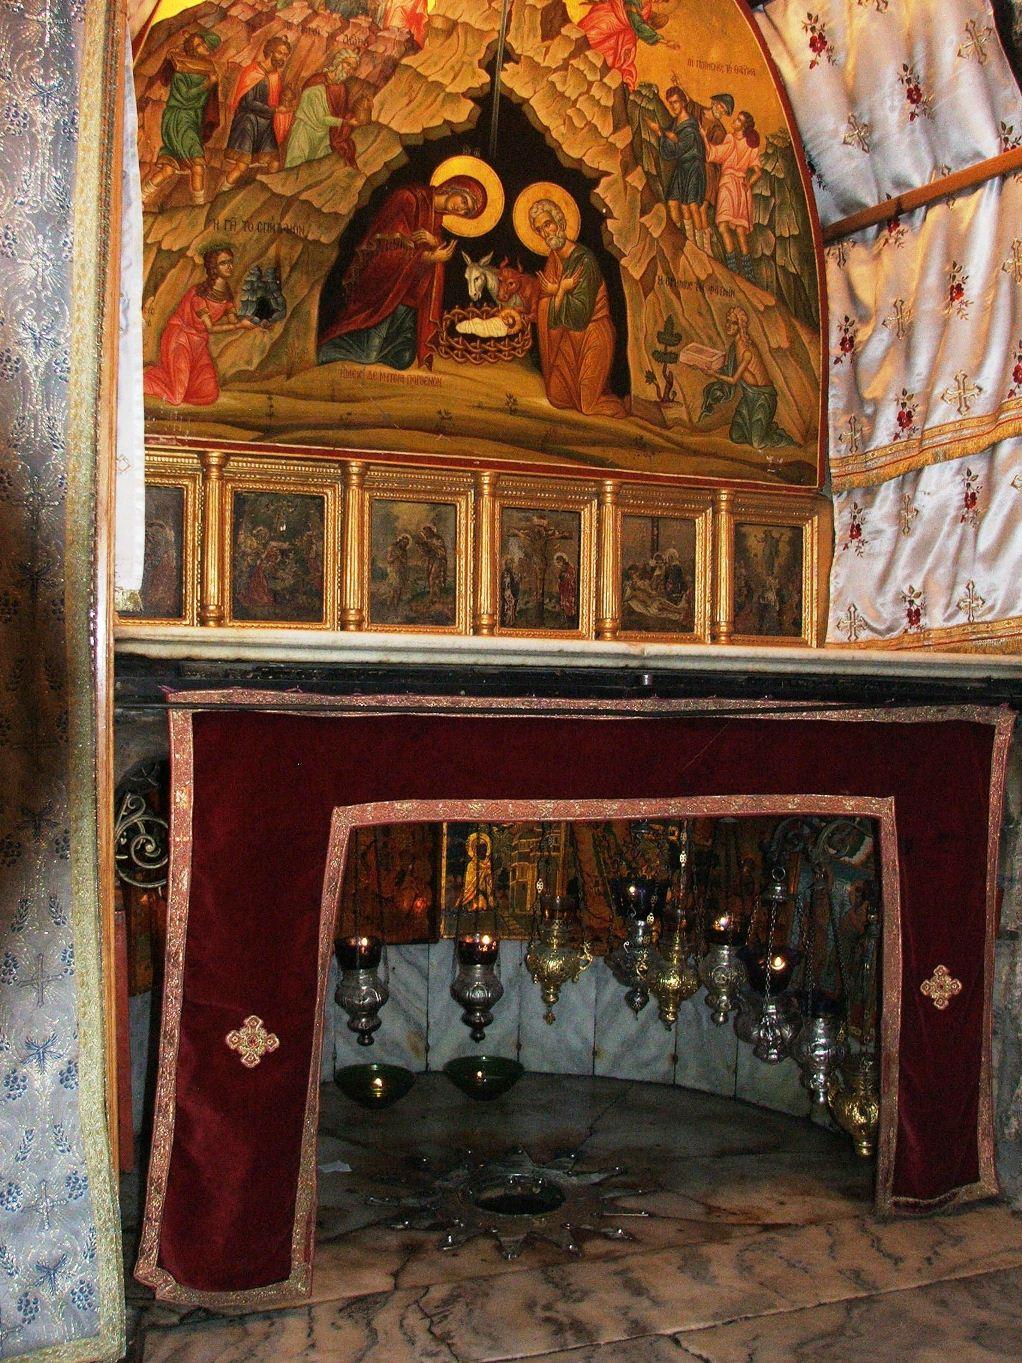 2 Bethleem, locul Nasterii Pruncului Iisus